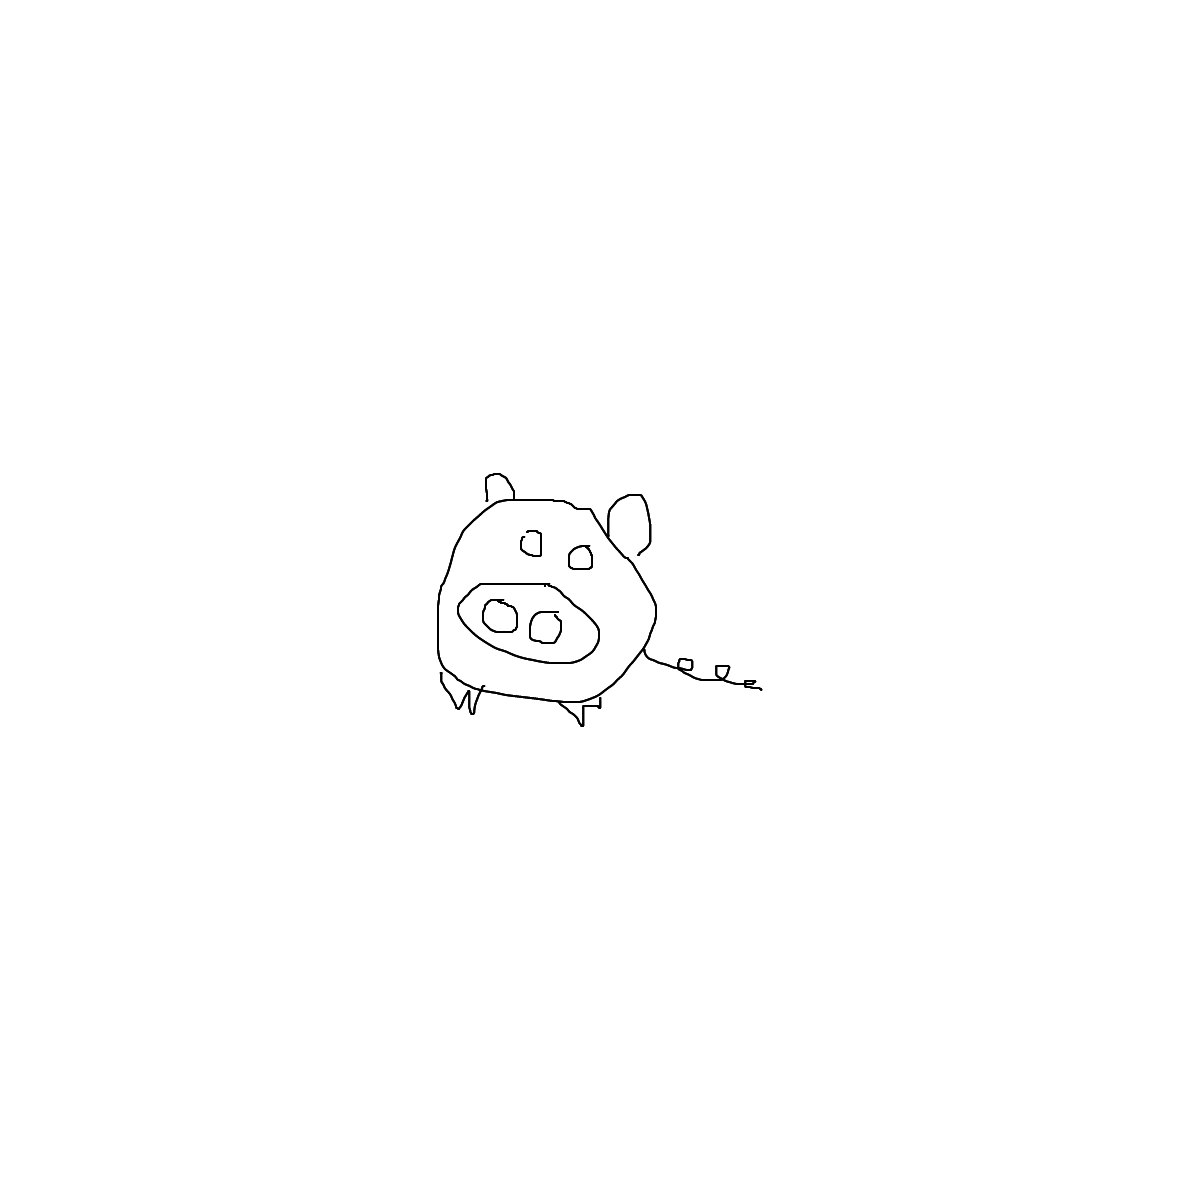 BAAAM drawing#10266 lat:41.9539184570312500lng: -72.7891540527343800